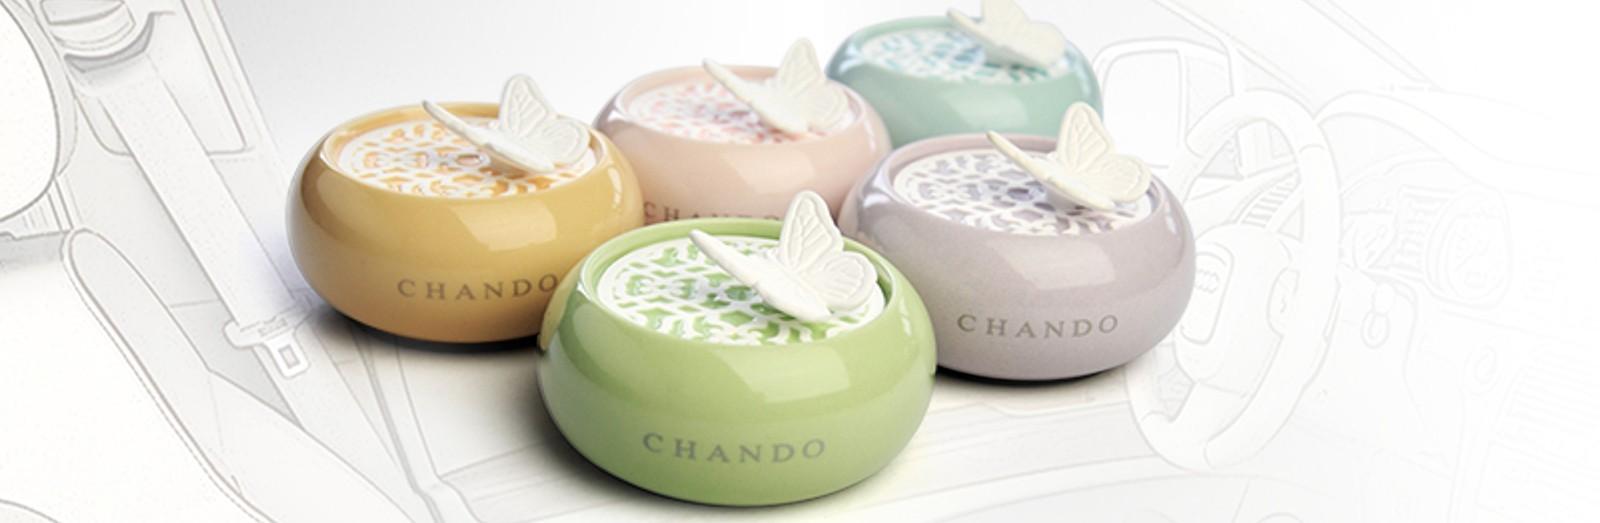 Chando porcelán illatosító